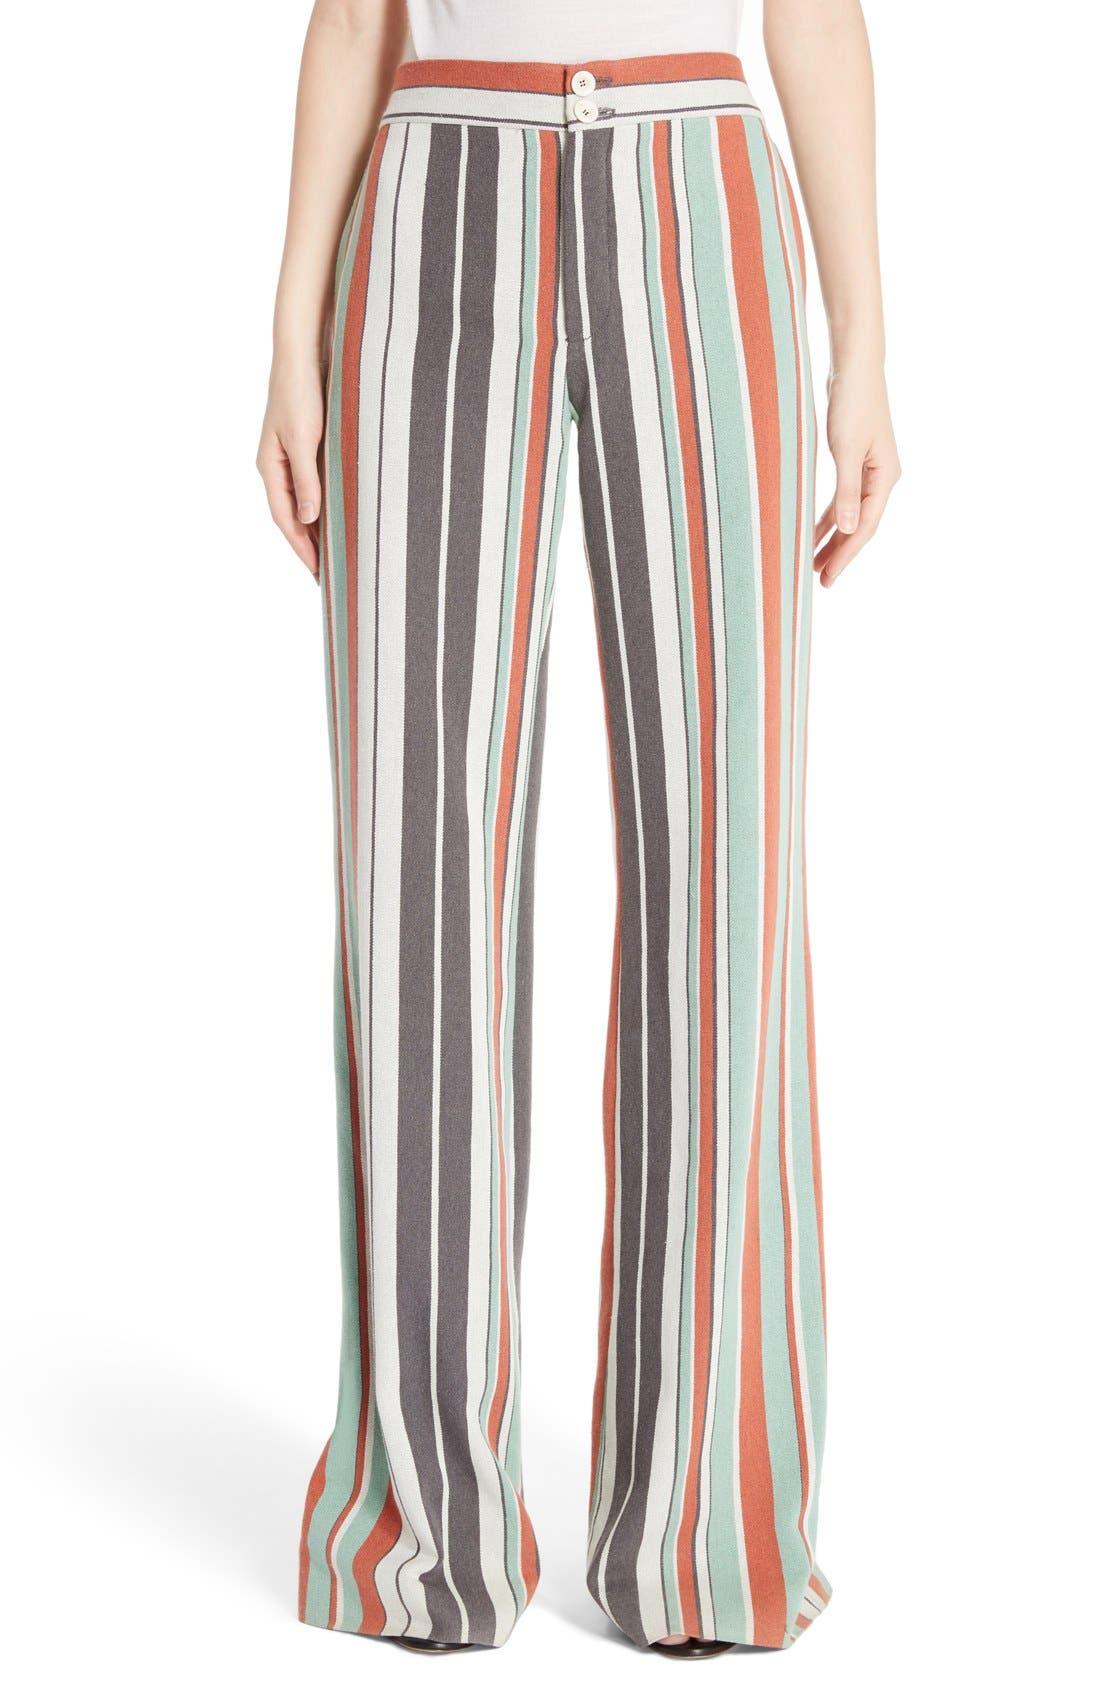 Alternate Image 1 Selected - Chloé Mixed Stripe Wide Leg Pants